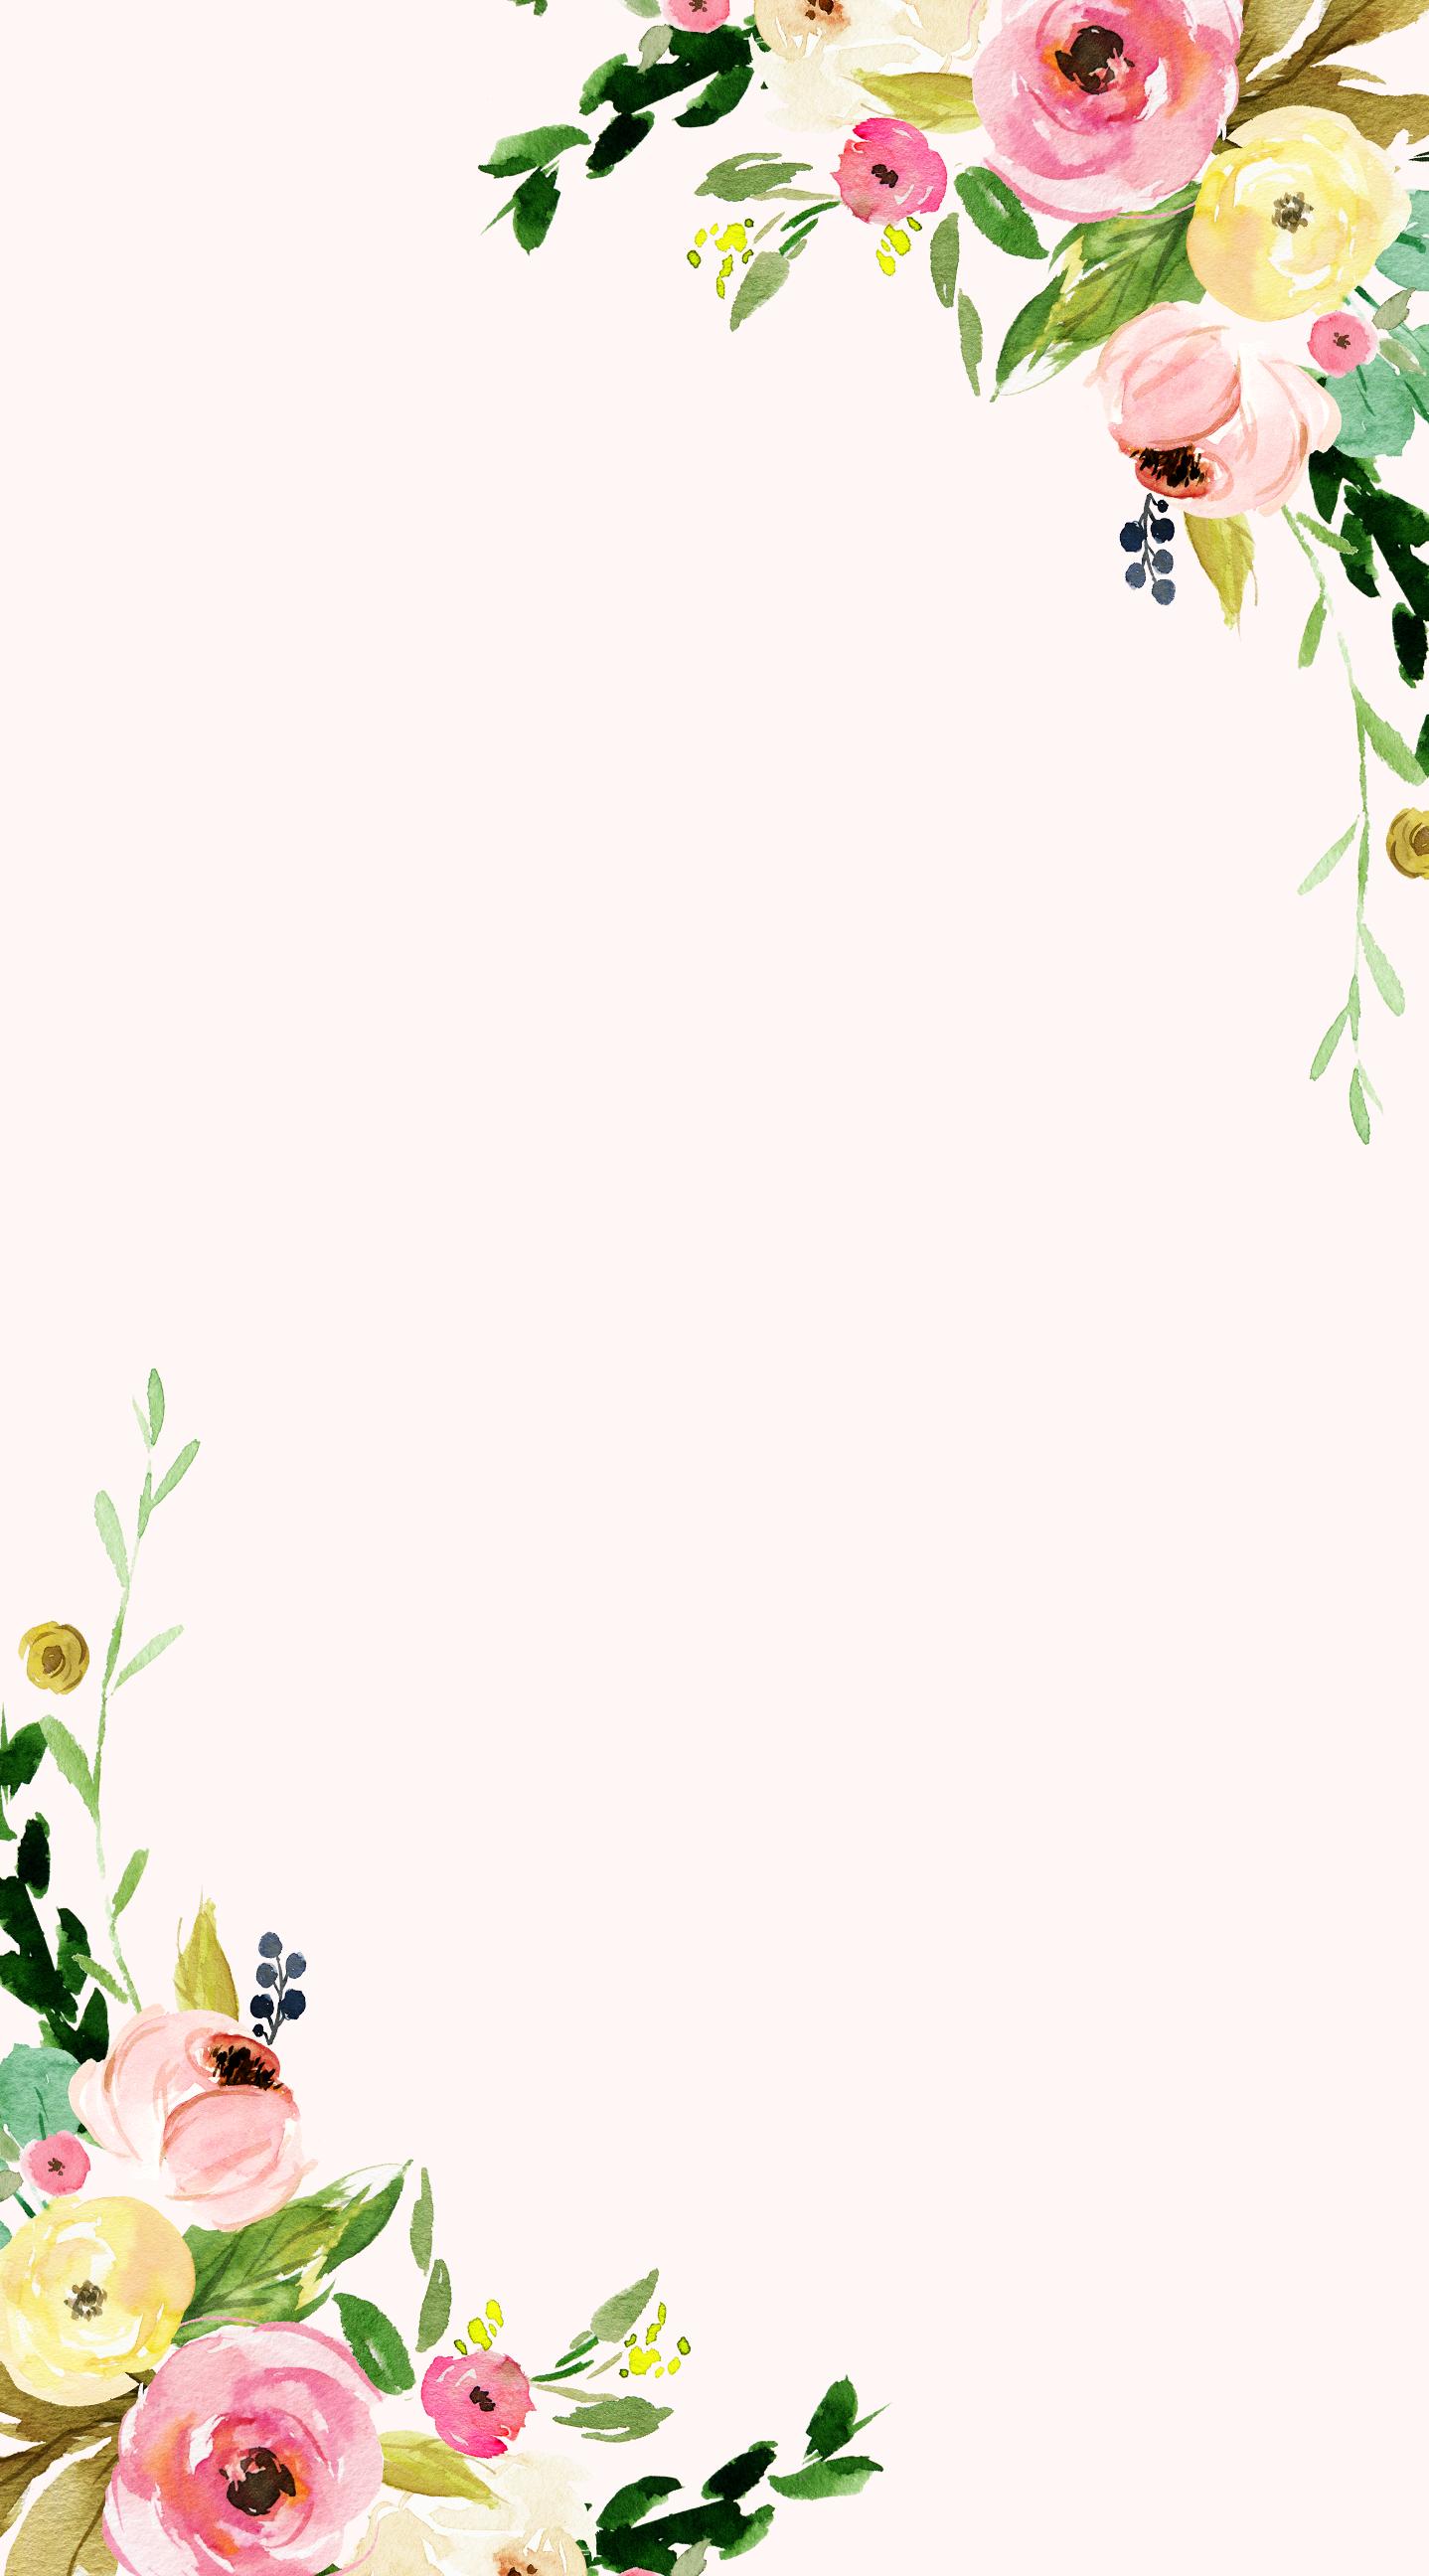 Pin By Razan On Eid Pinterest Wallpaper Iphone Wallpaper And